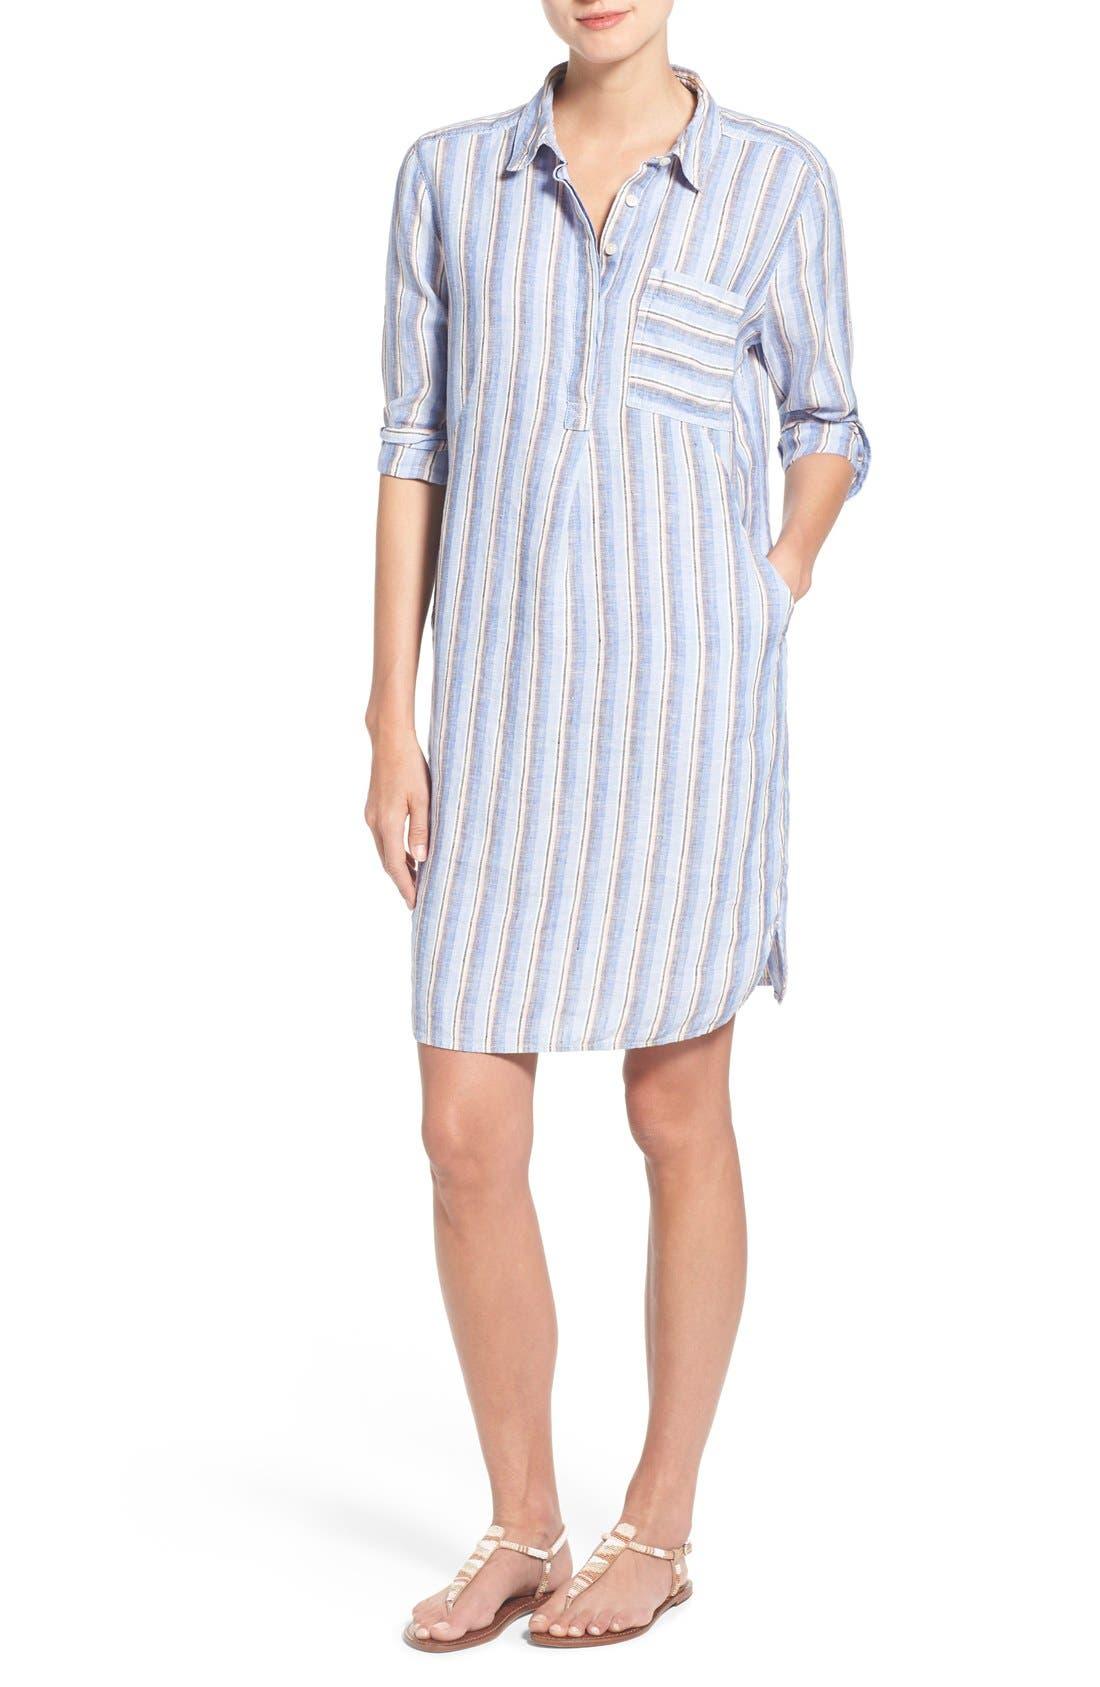 Alternate Image 1 Selected - Caslon® Linen Shirtdress (Regular & Petite)